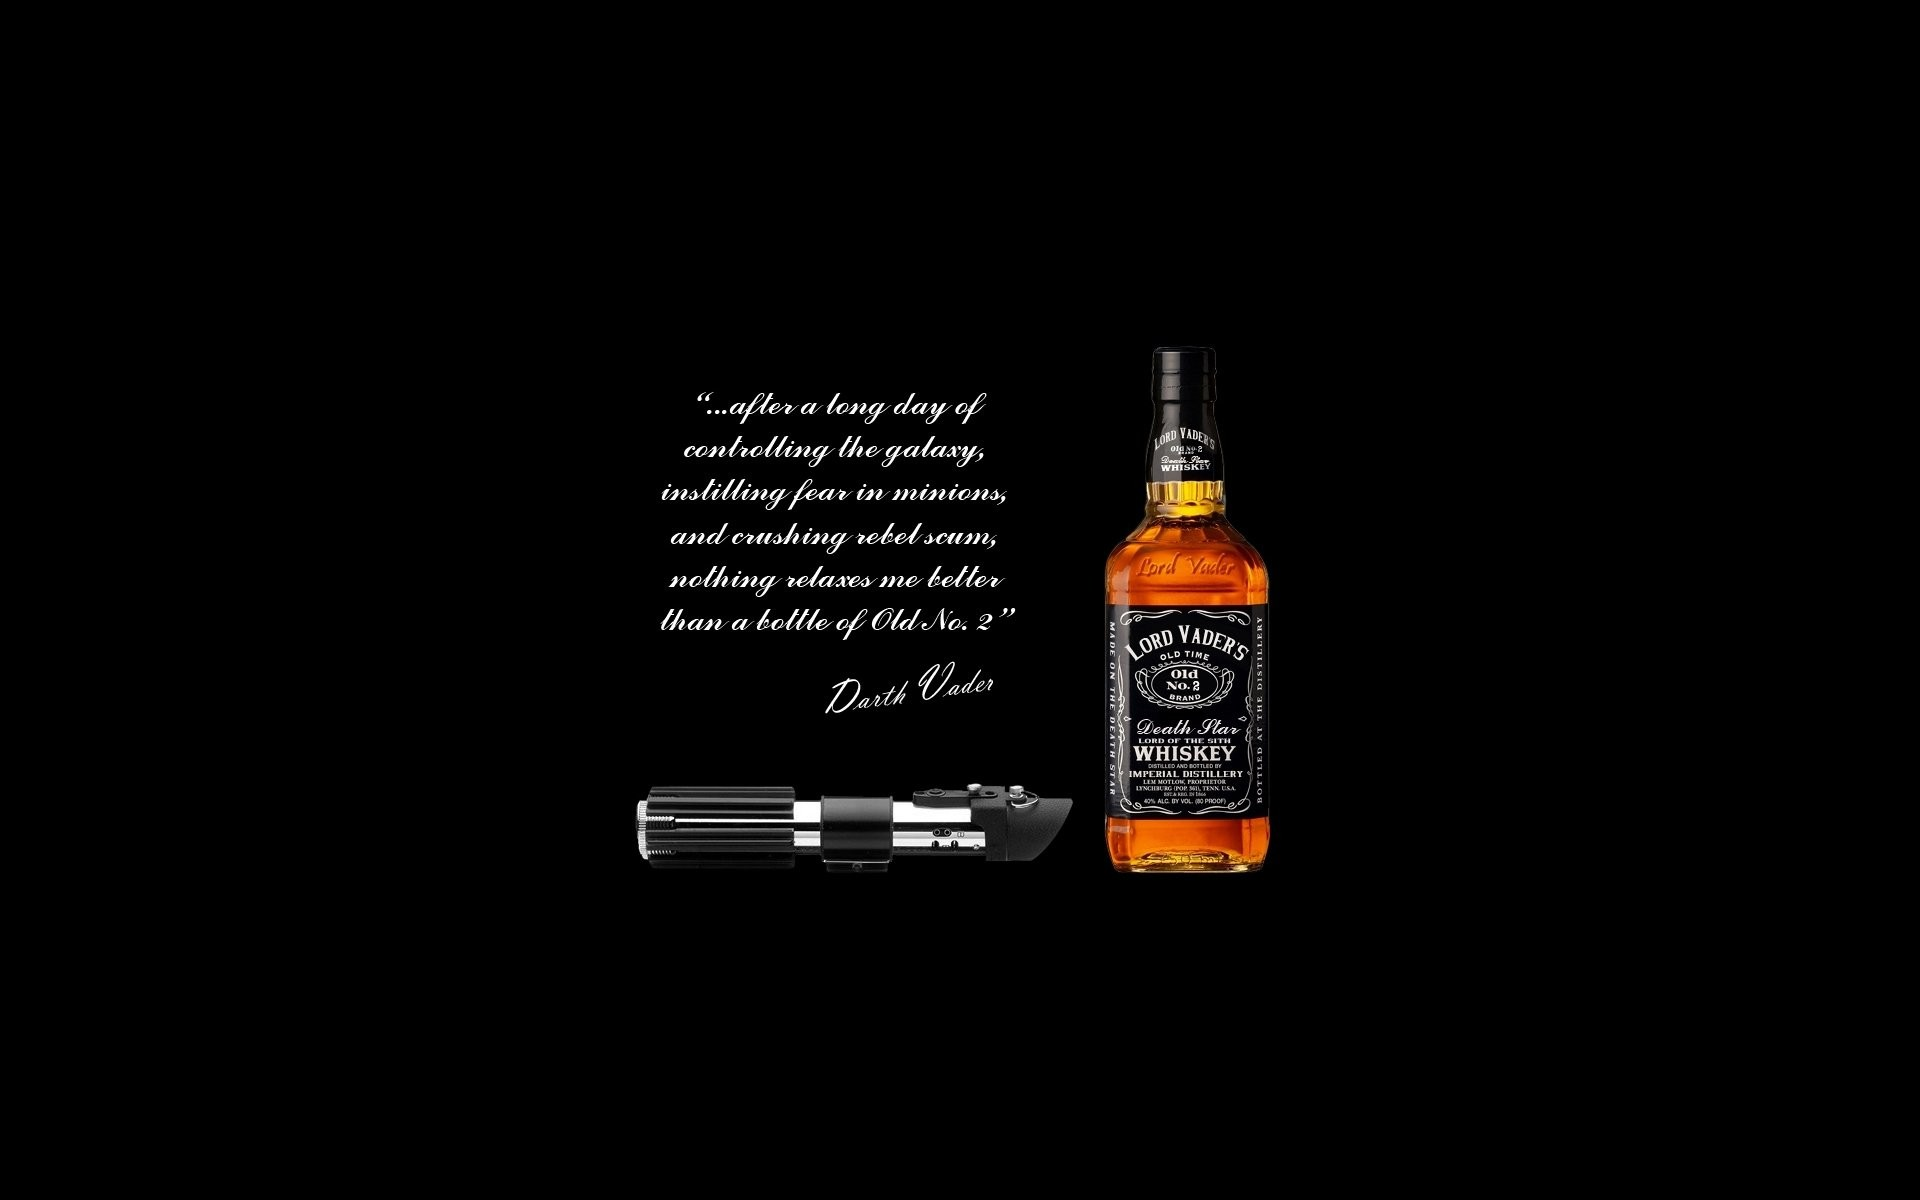 Humor – Movie Humor Star Wars Black Alcohol Darth Vader Whisky Lightsaber  Wallpaper